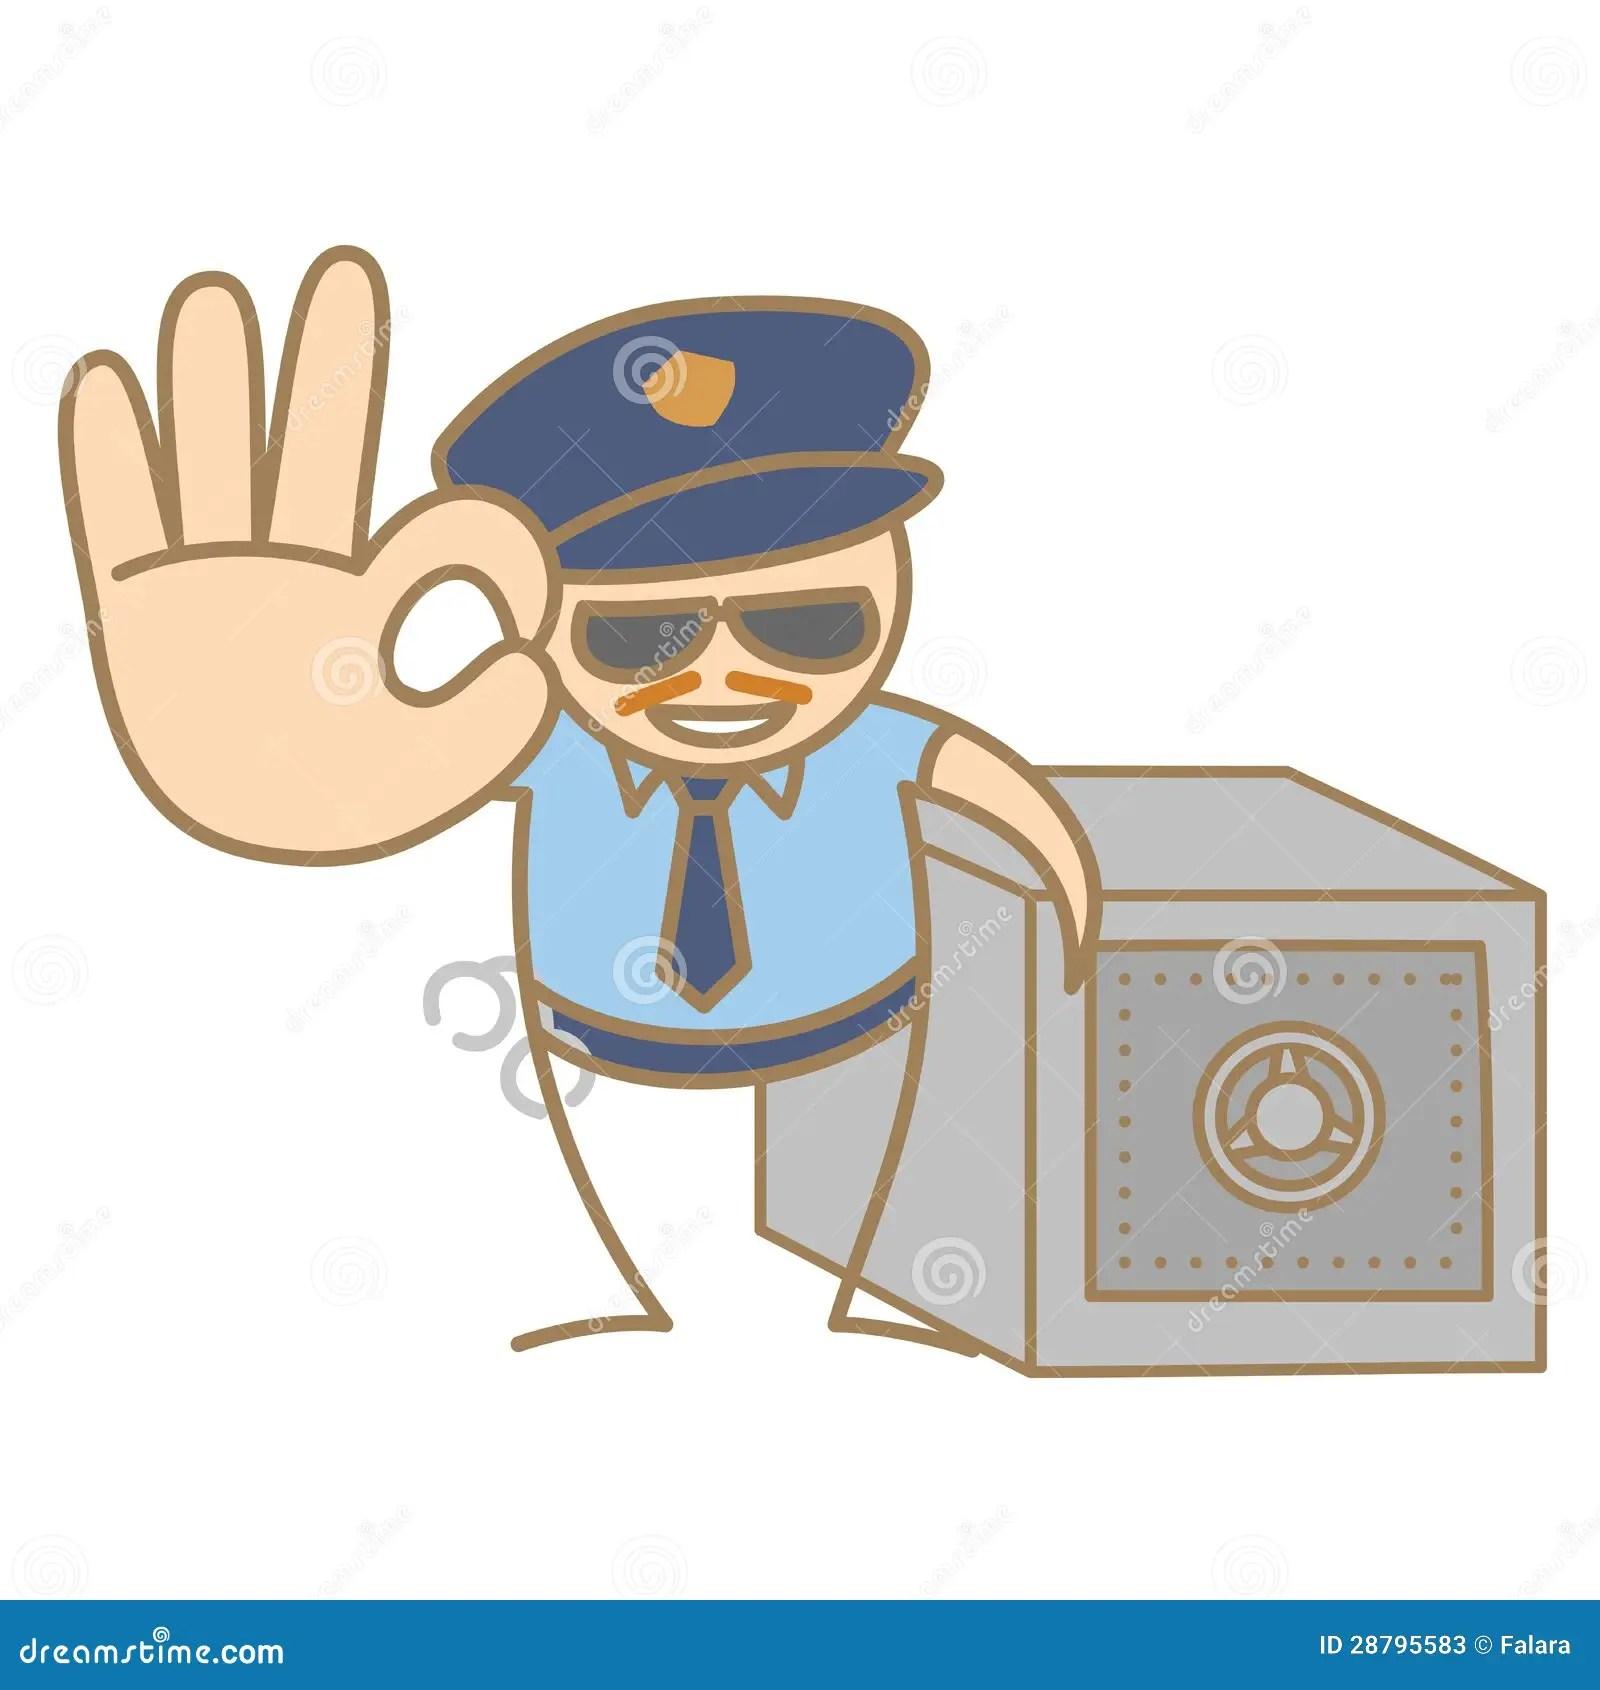 Security Bank Uniform